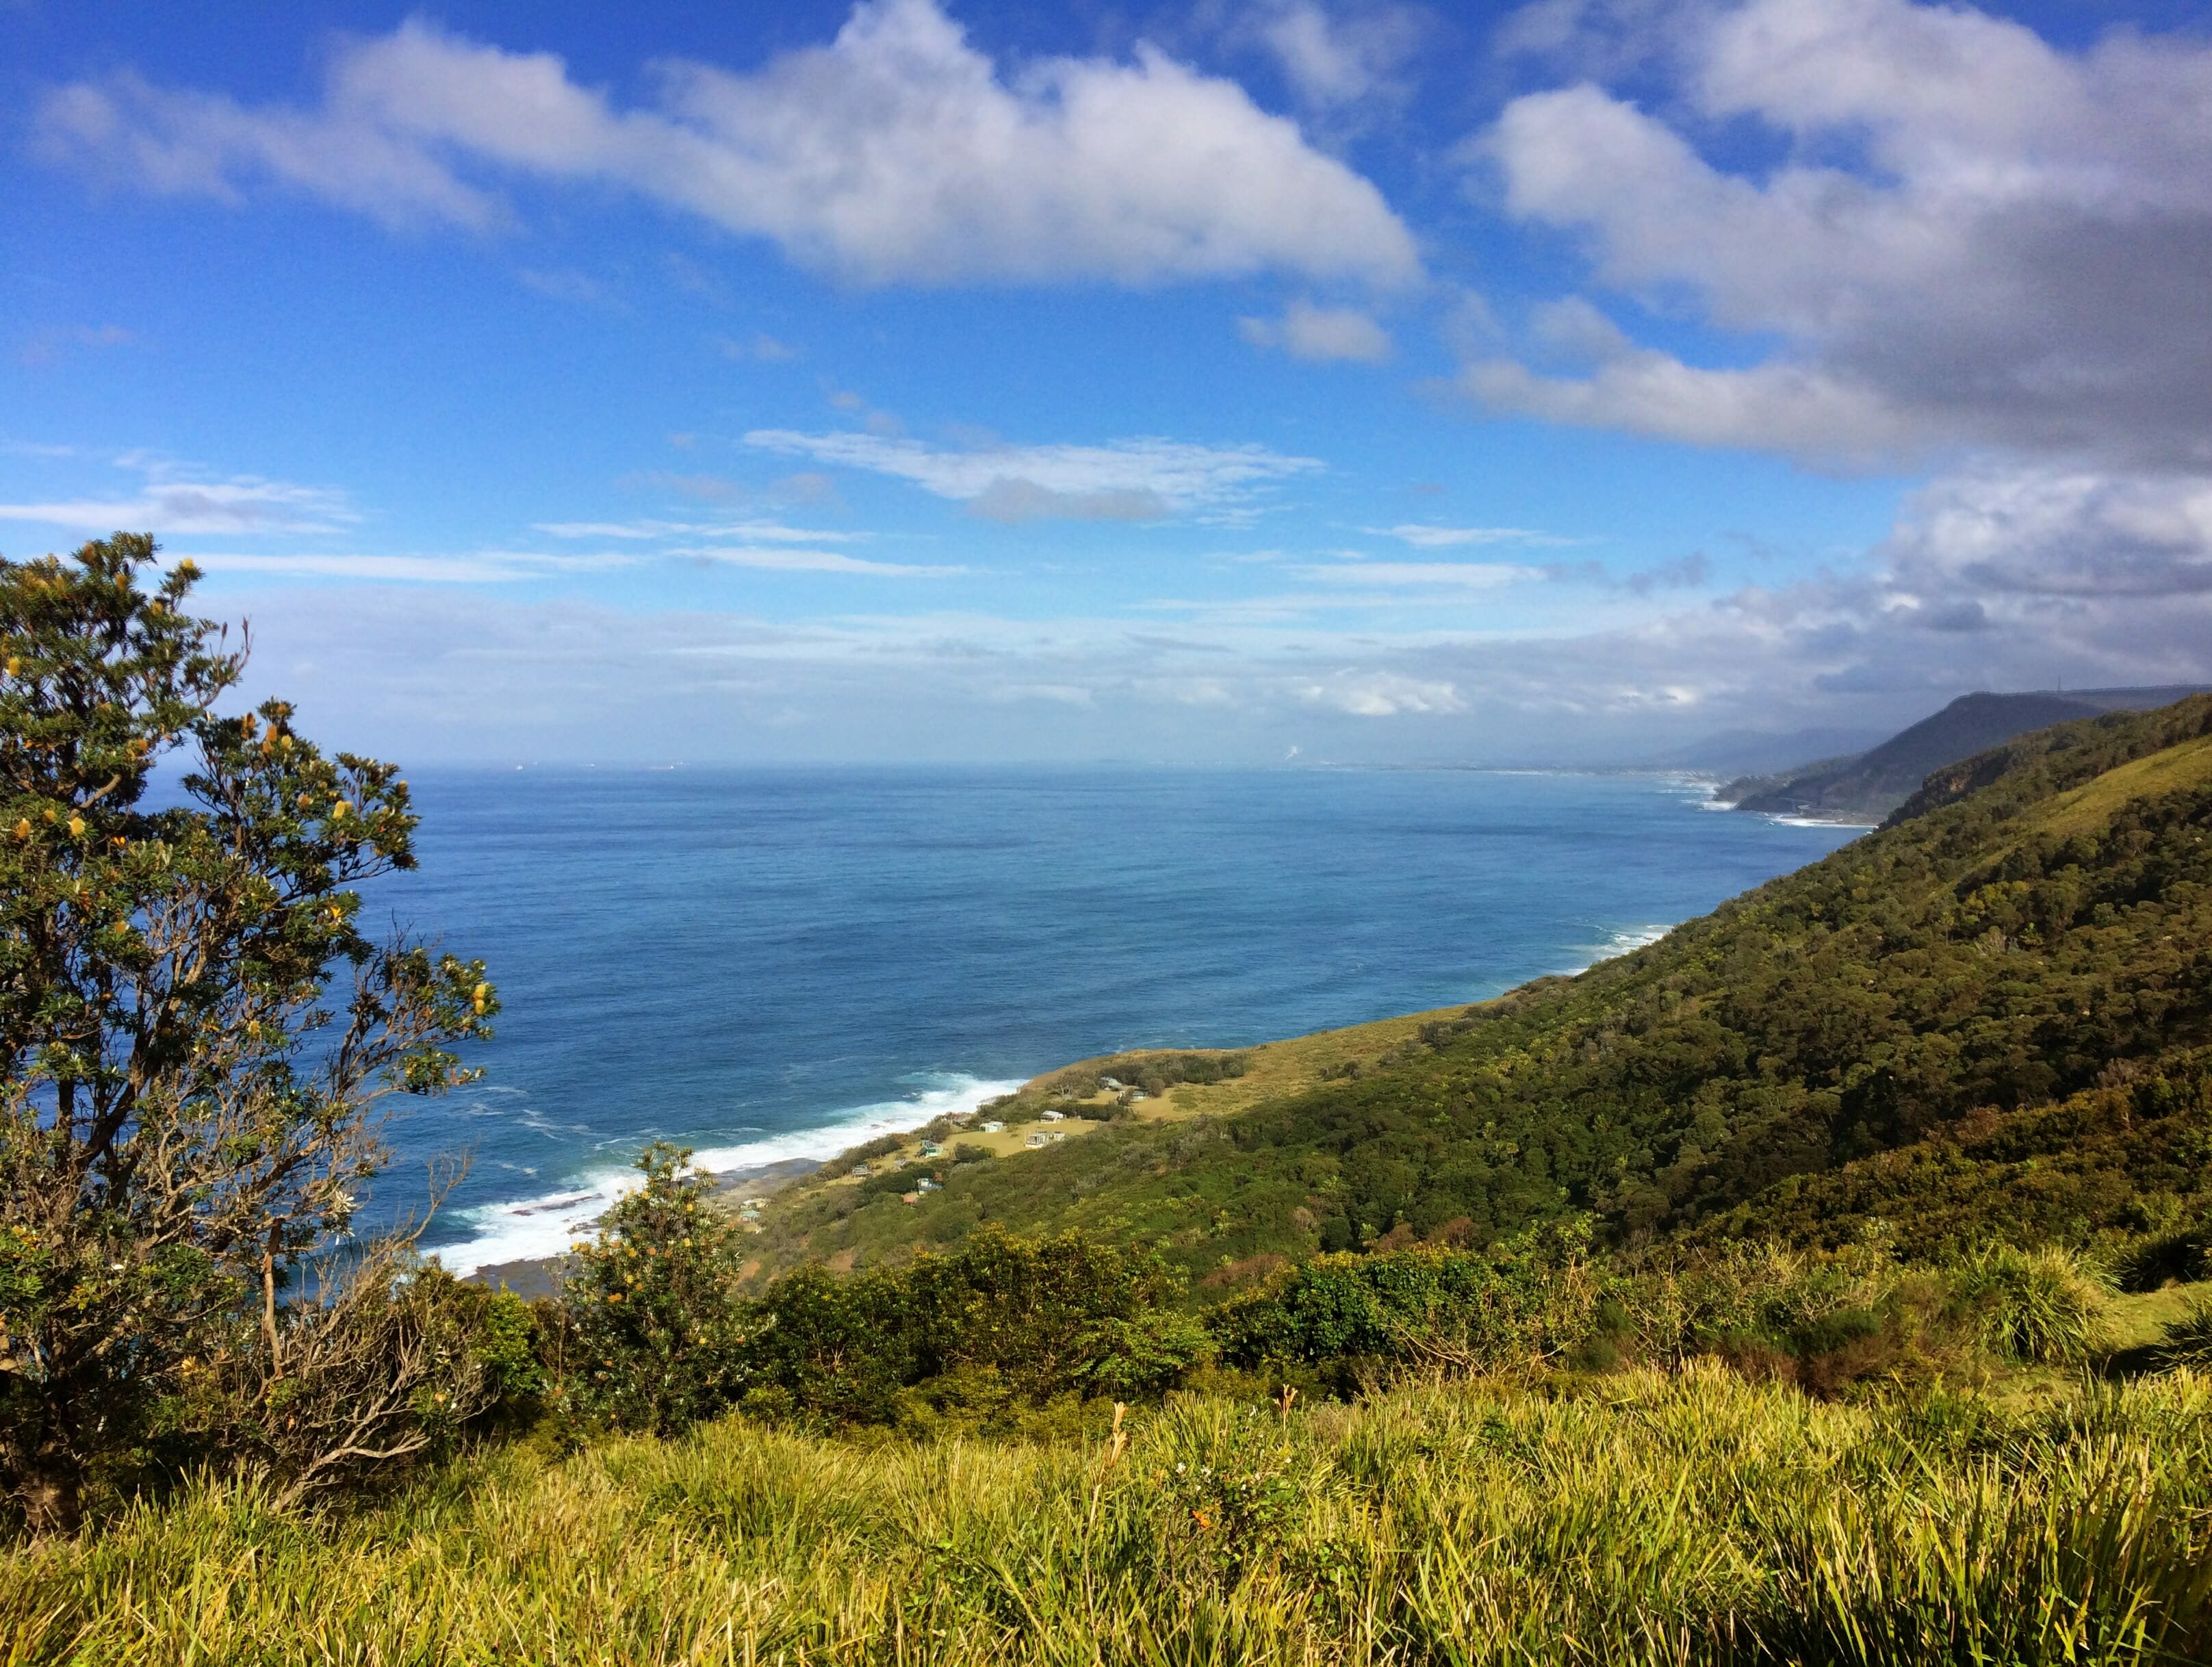 Illawara coastline